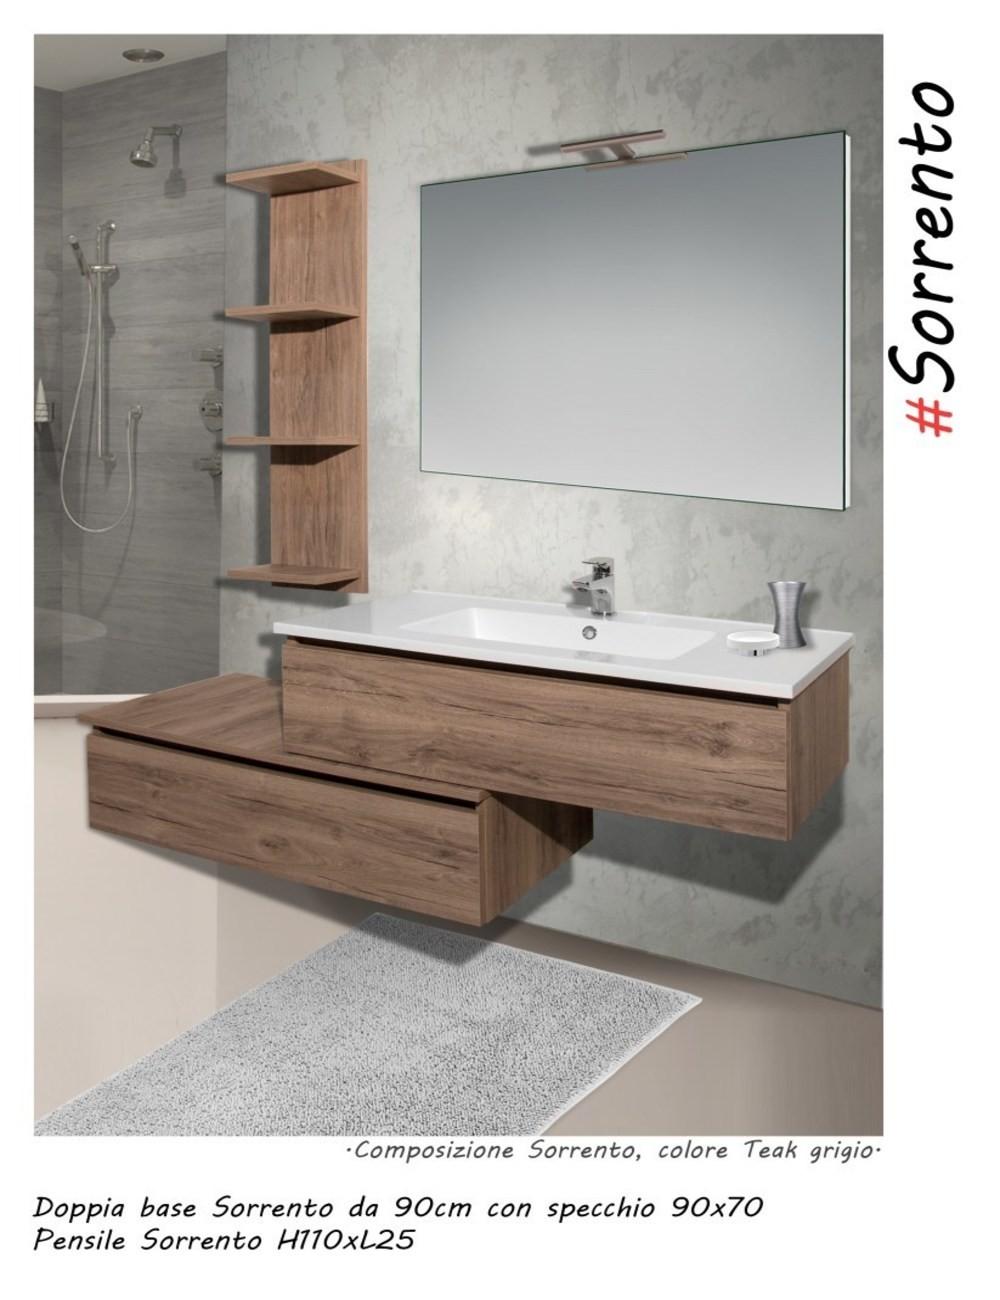 Mobile bagno sorrento 90 centimetri nobilitato laminato - Mobile bagno laminato ...